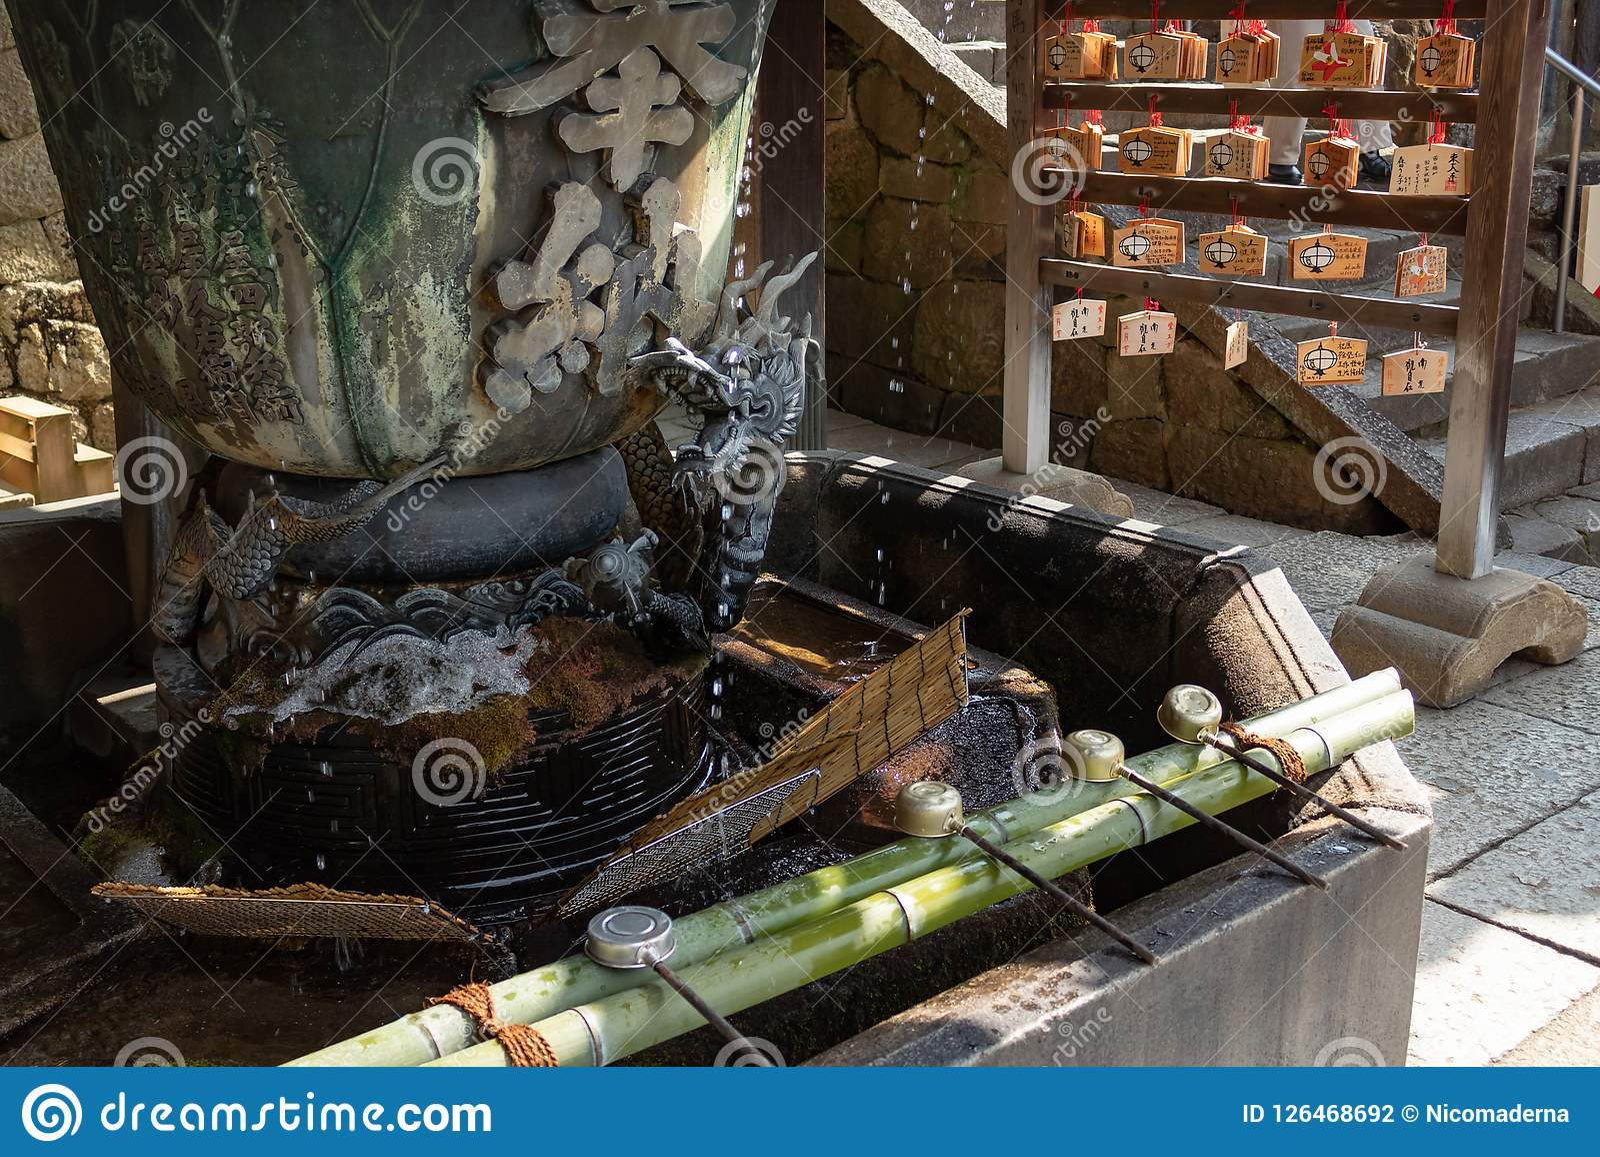 NARA, JAPAN - JAN 30, 2018: Dragon fountain for Chozuya water purification rite in temple of Osaka